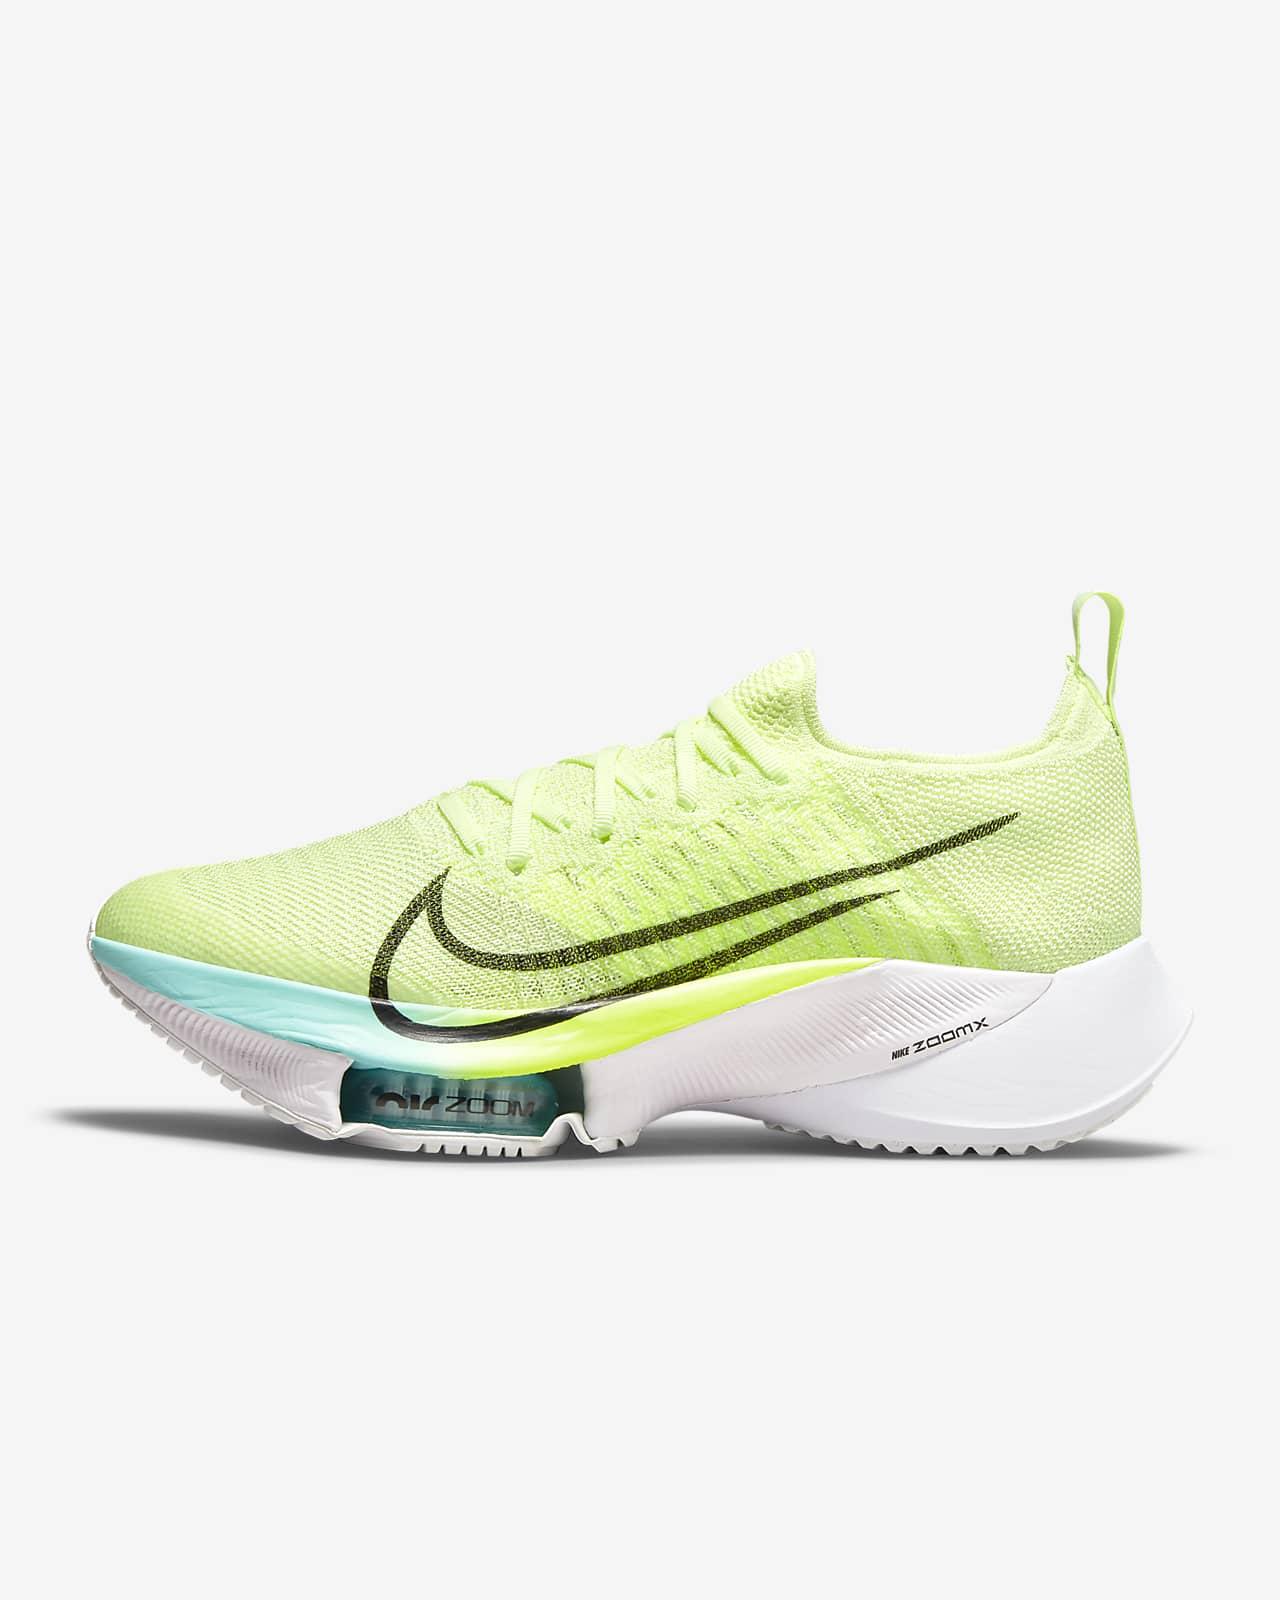 Chaussure de running Nike Air Zoom Tempo NEXT% pour Femme. Nike LU